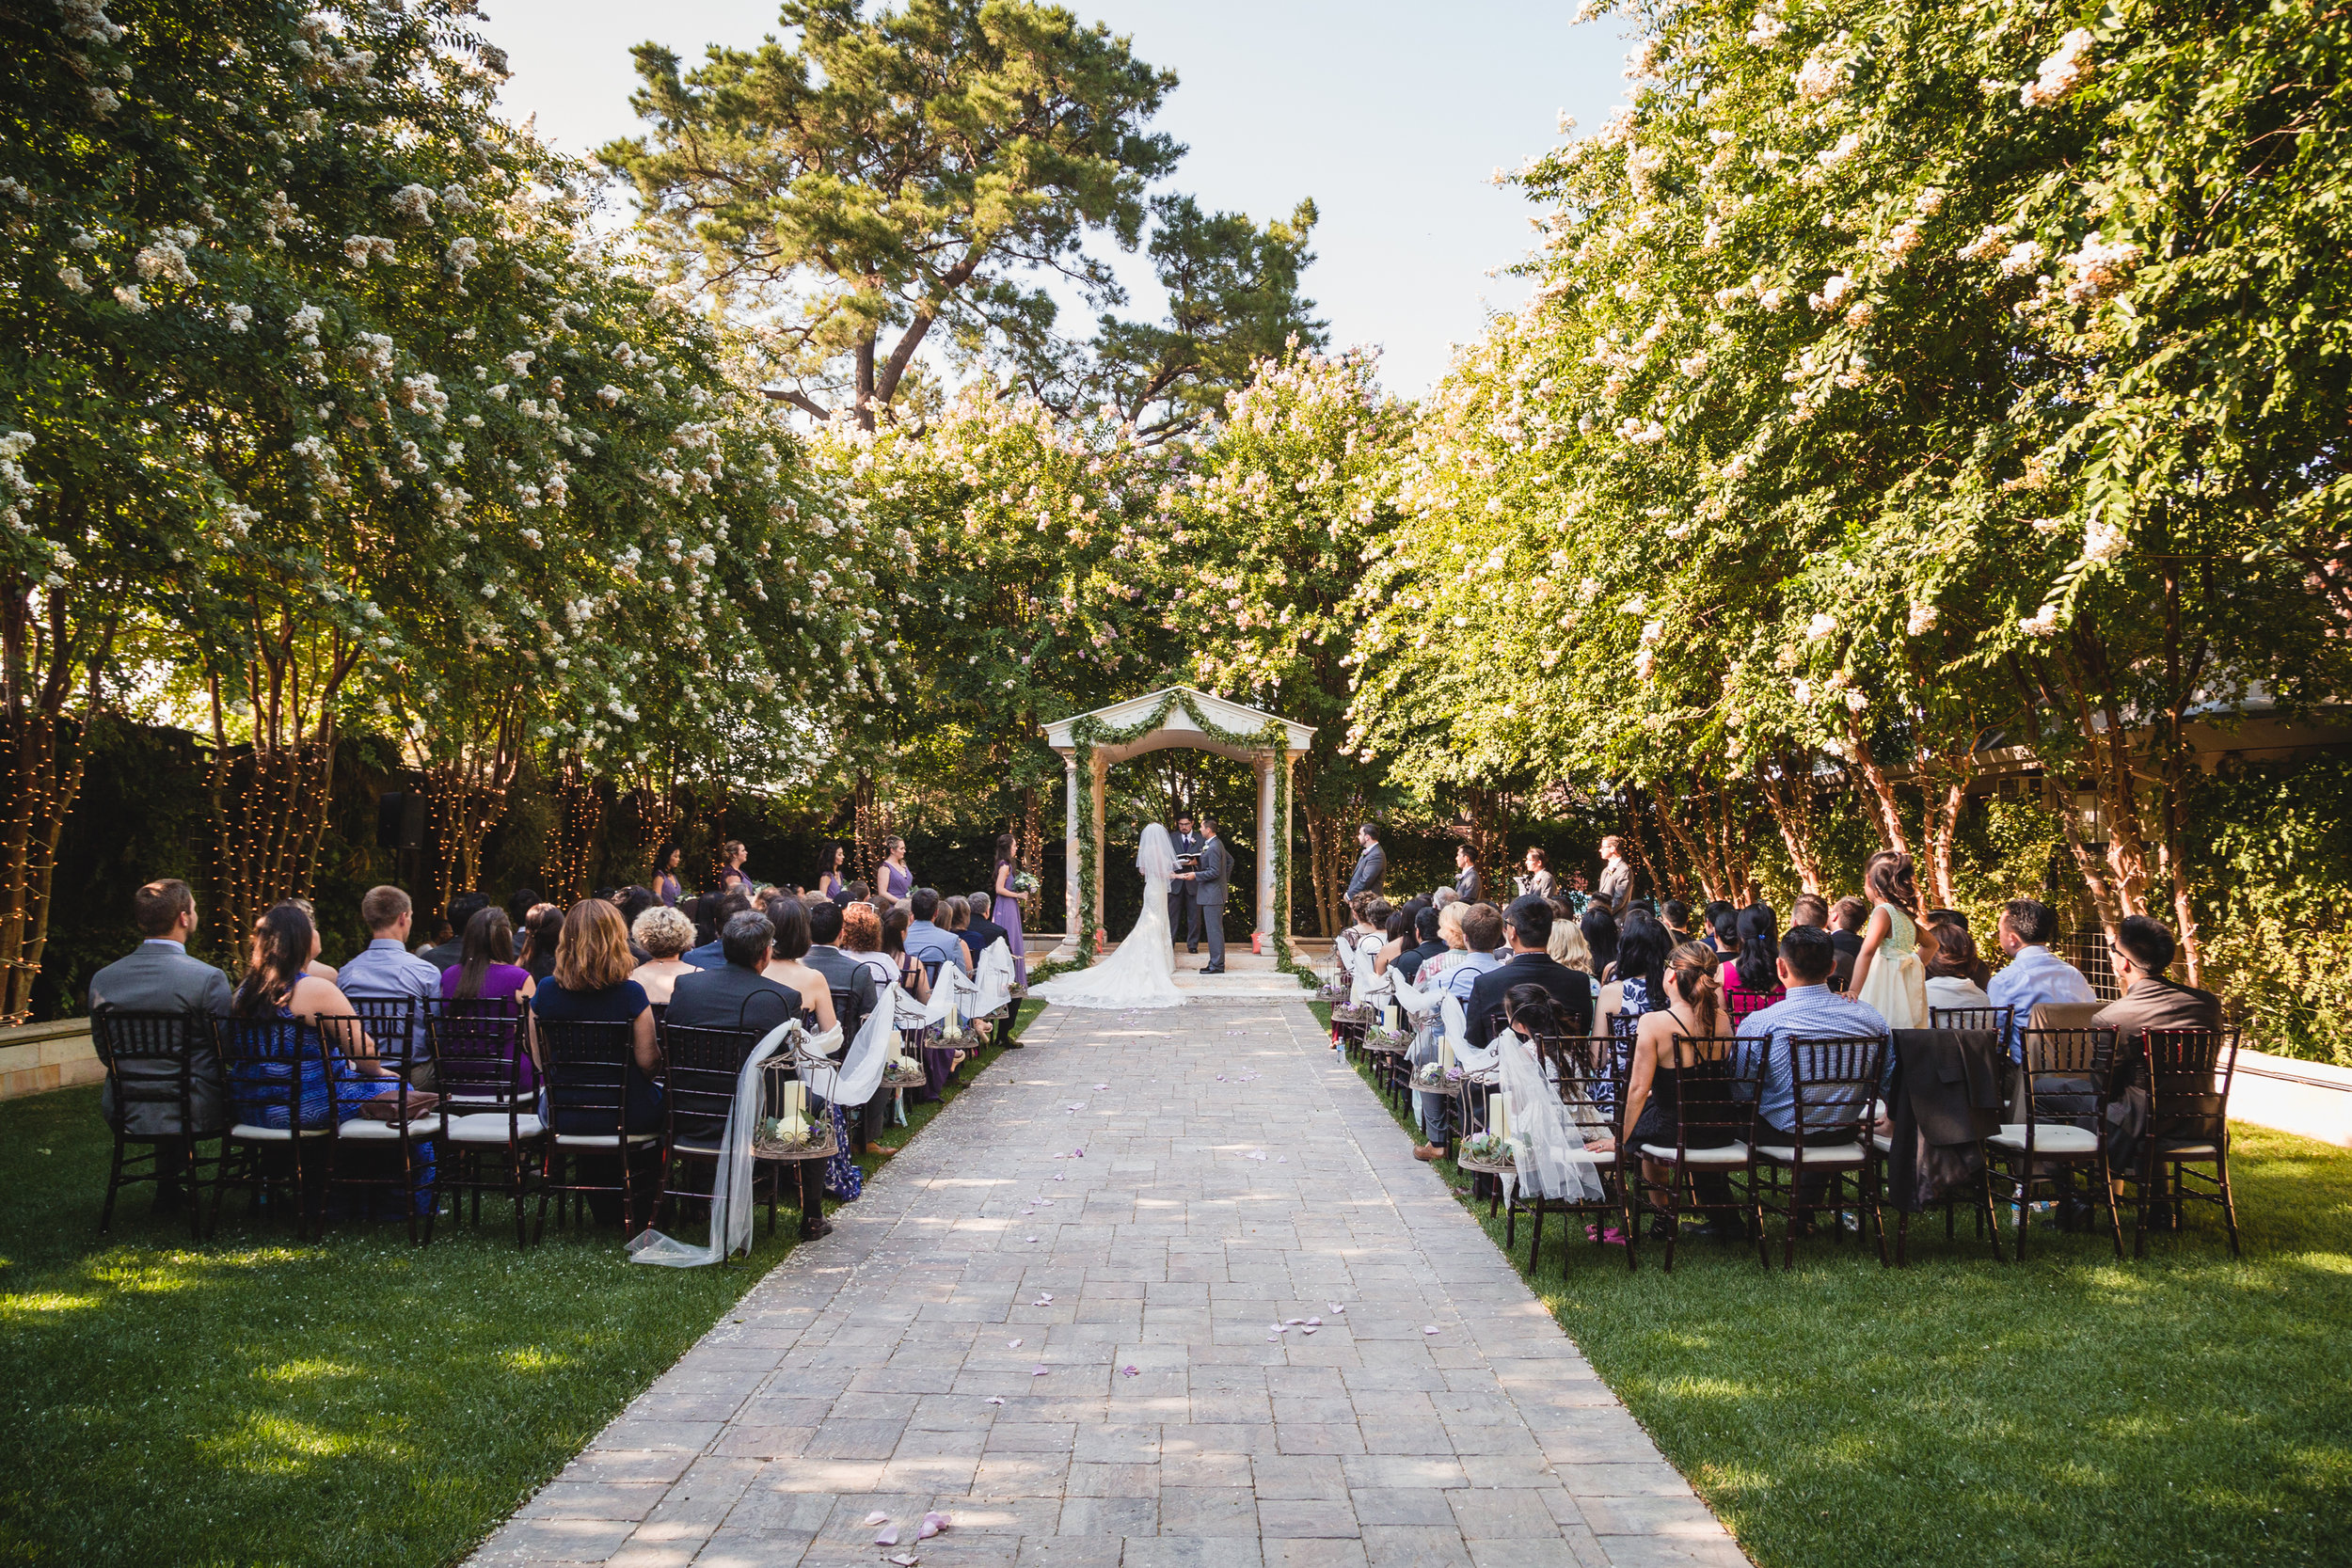 rebeccaylasotras-bay-area-garden-wedding-28.jpg